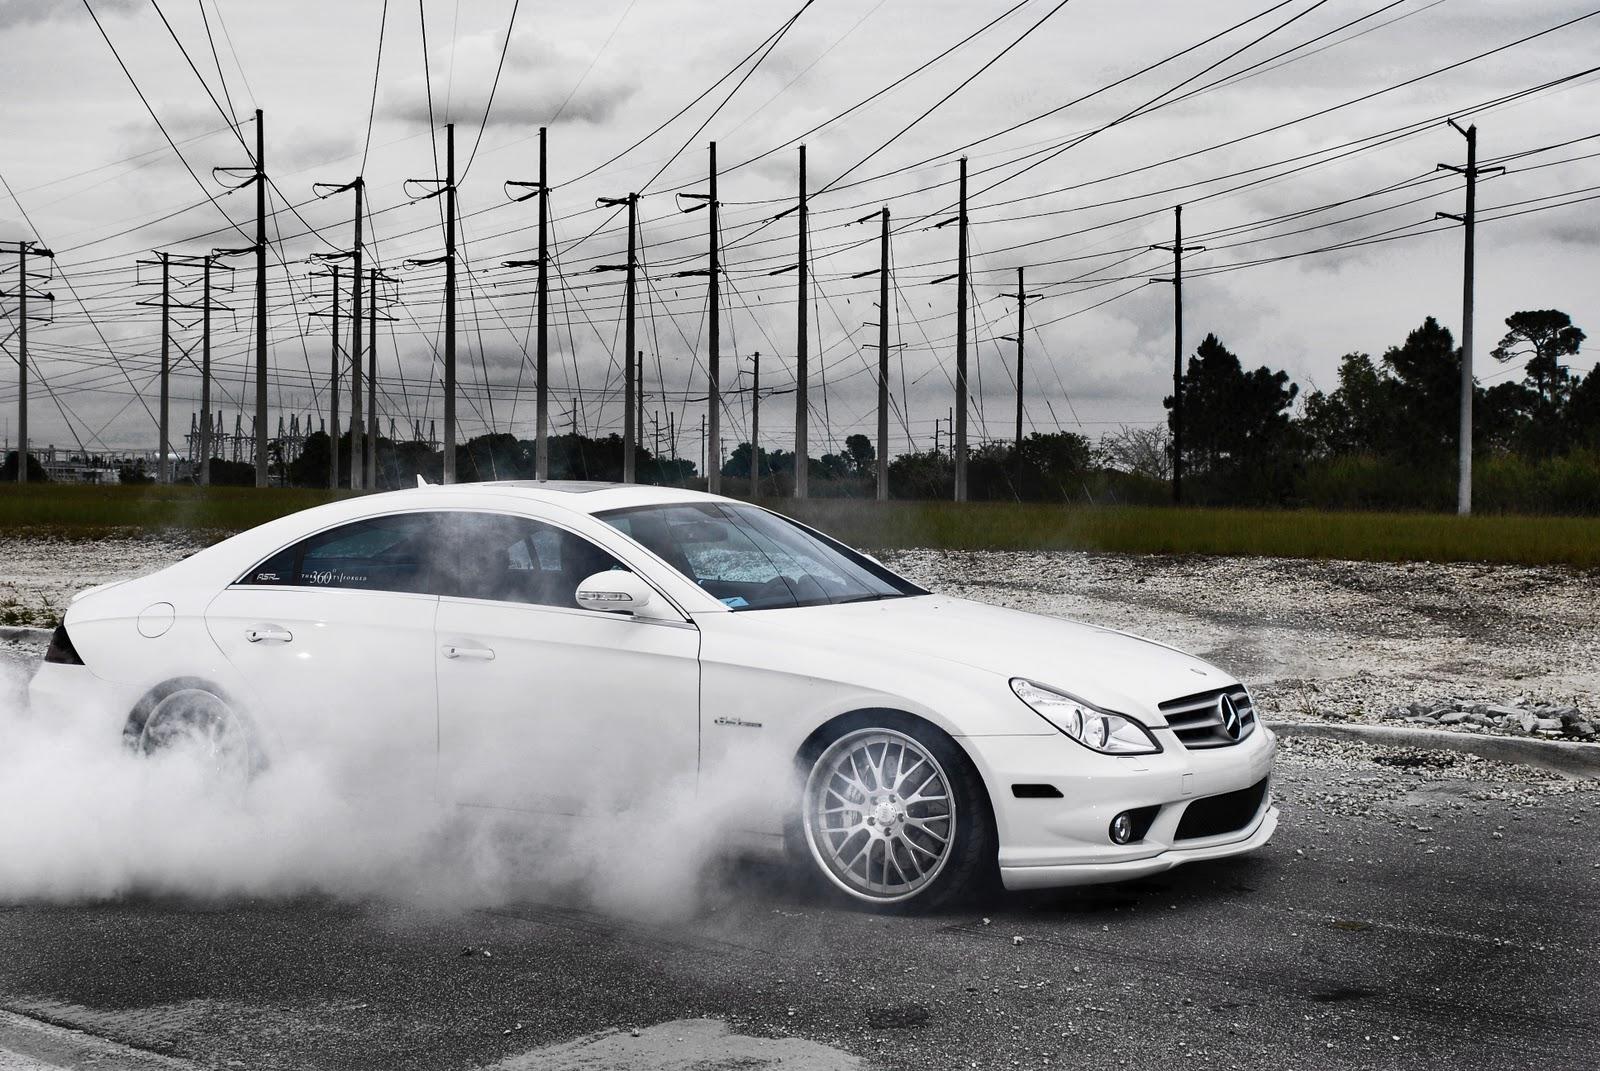 http://4.bp.blogspot.com/_Y5-4Z4aPcOI/TUfO038kWjI/AAAAAAAABMI/47Q5y5vgZiE/s1600/Auto+Cars+-+FreeHD.Blogspot.Com+%2528124%2529.jpg